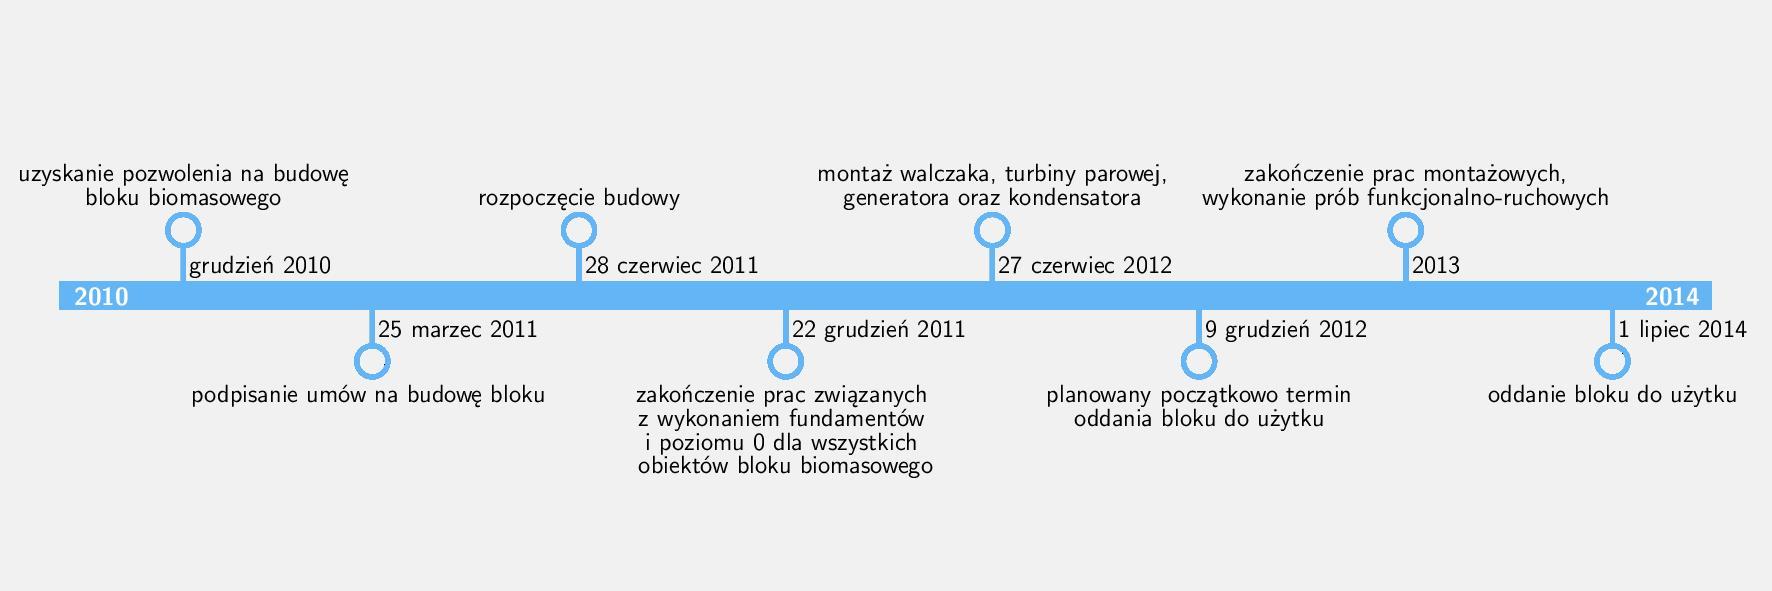 Roboczy-page-001